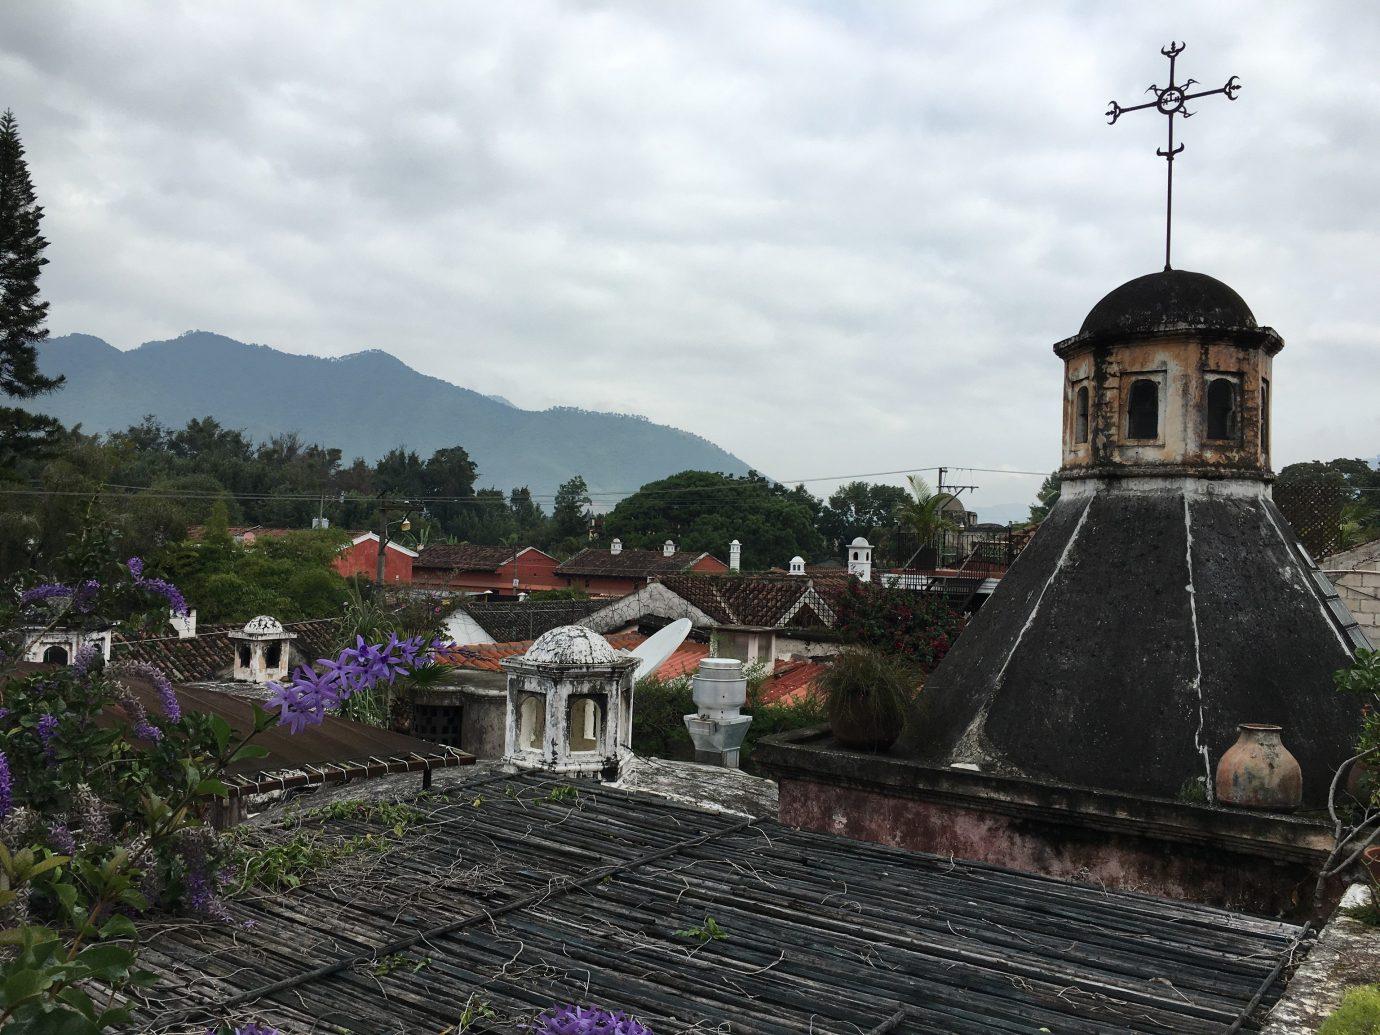 Trip Ideas sky outdoor landmark building Town tower tourism vacation place of worship Church shrine monastery temple Garden